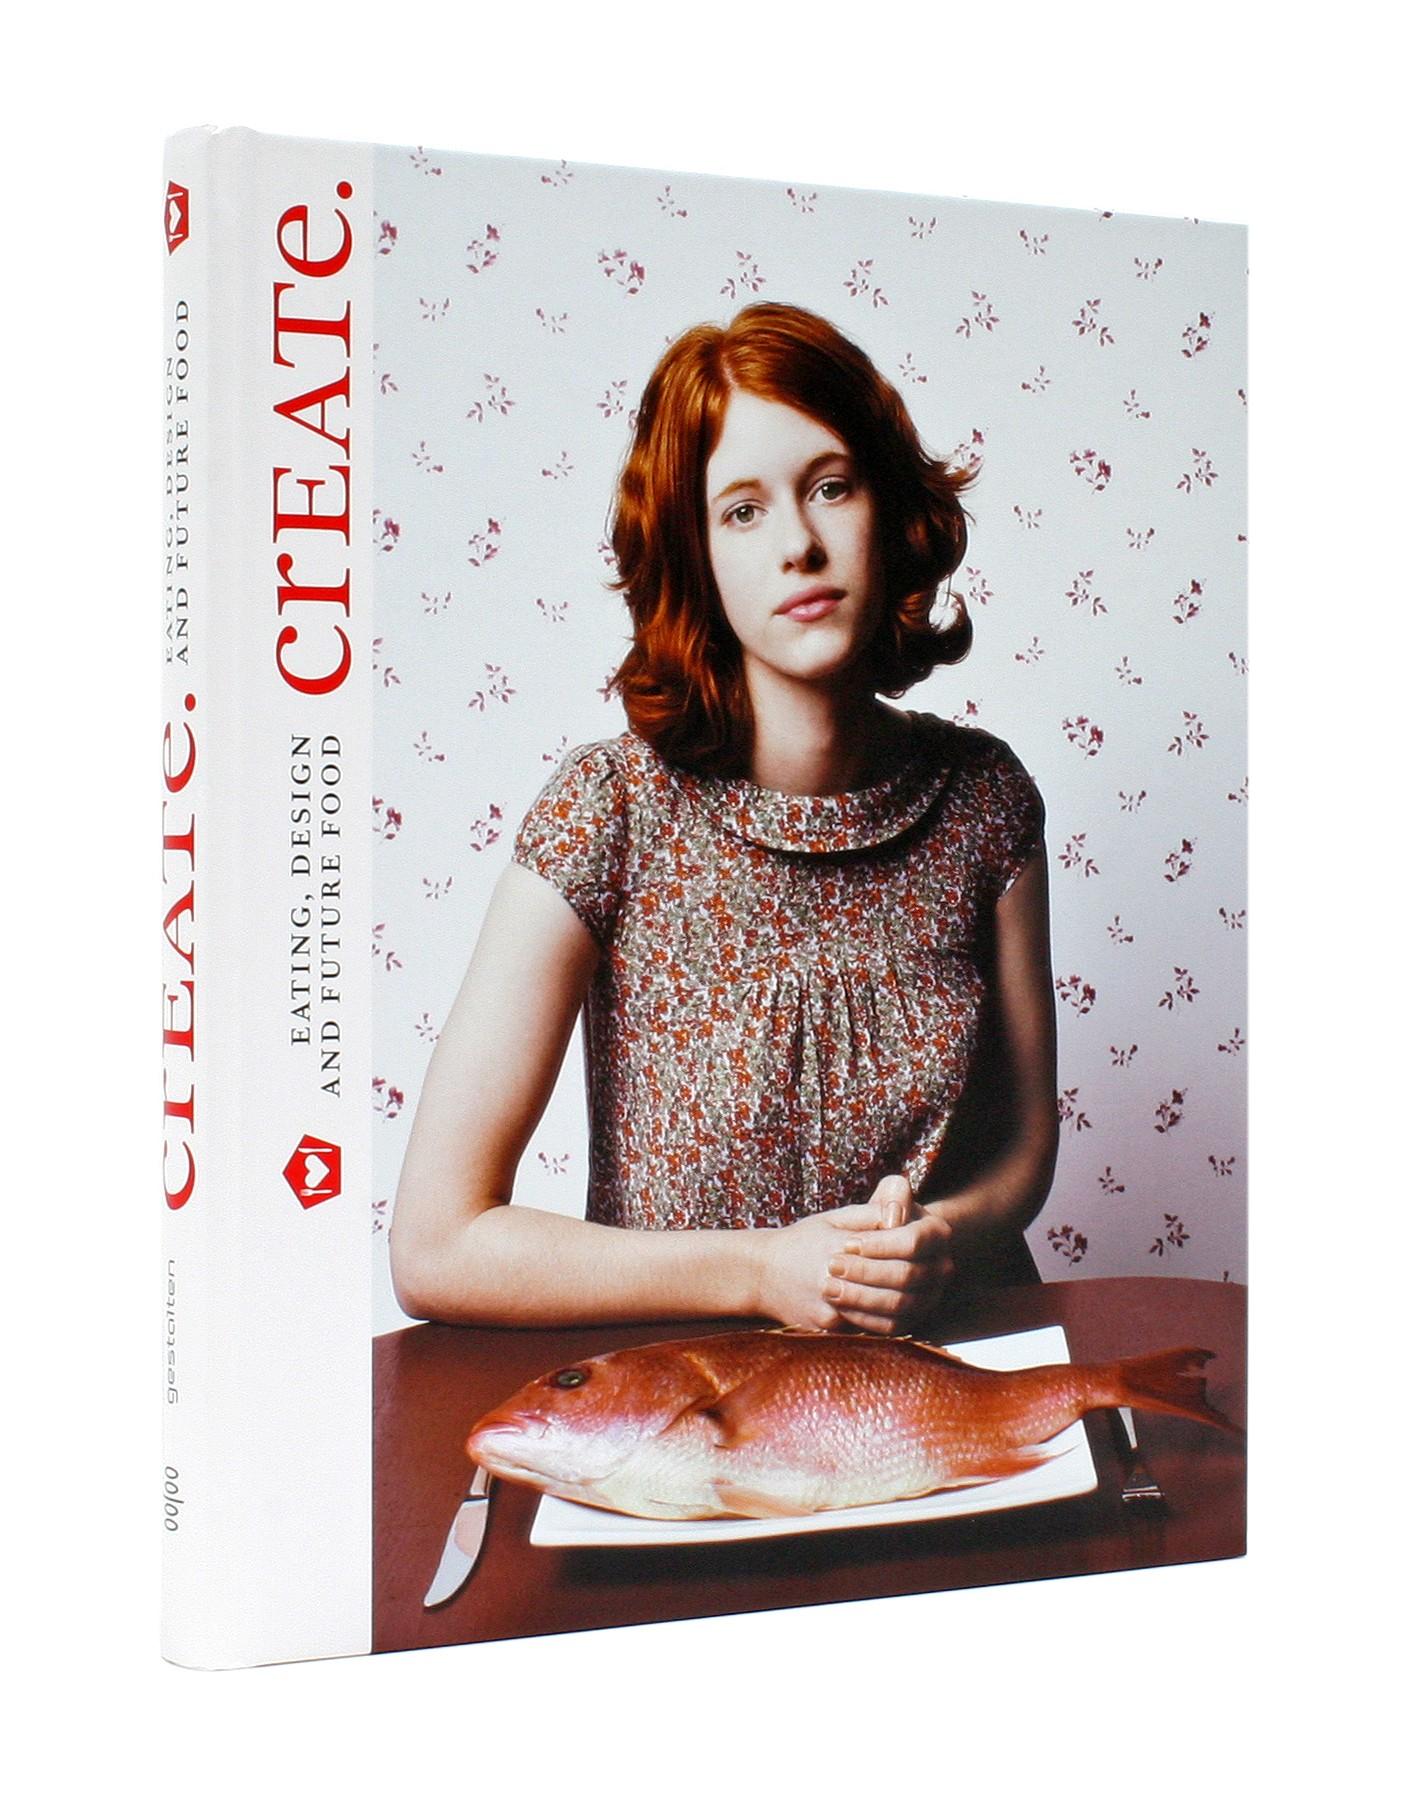 say hi to_ CrEATe. by Gestalten